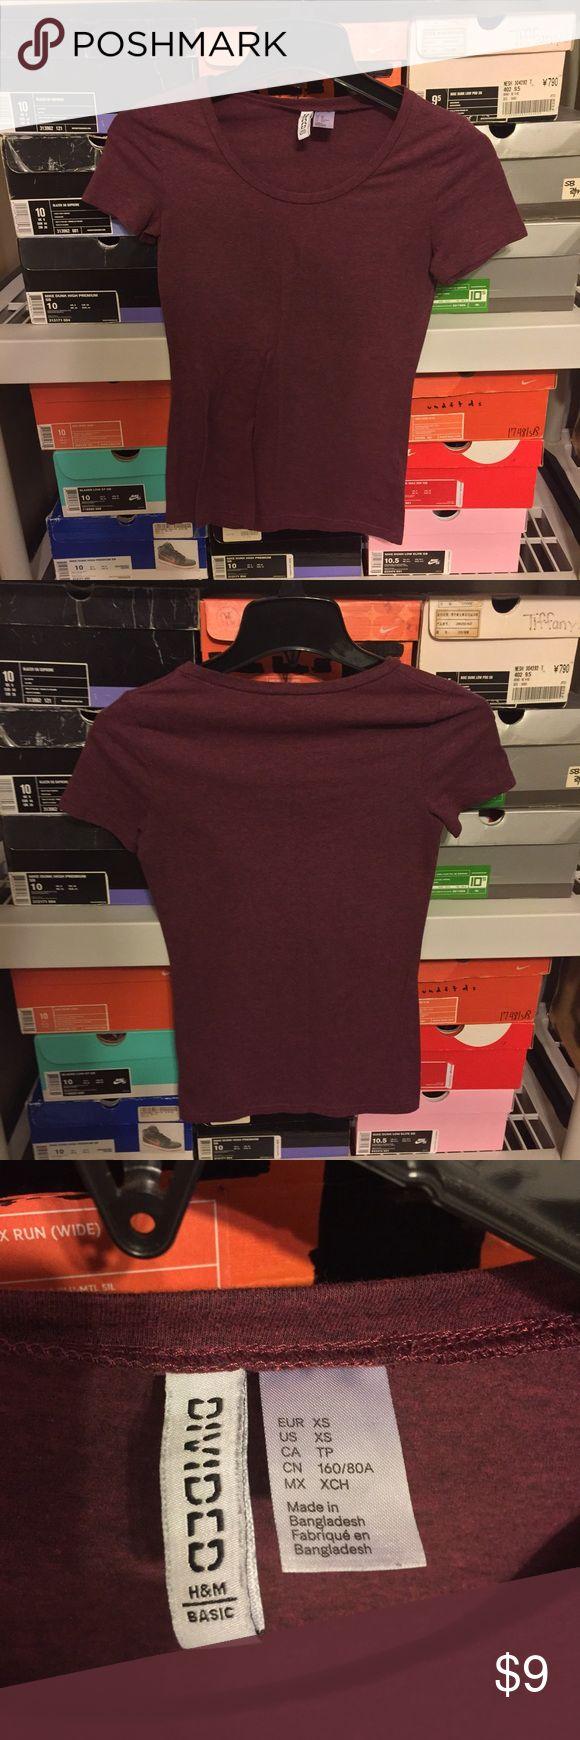 Women's H&M basic t Shirt Purple size Small Women's H&M Purple Basic T shirt   Size XS  Good condition has slight fading! H&M Tops Tees - Short Sleeve